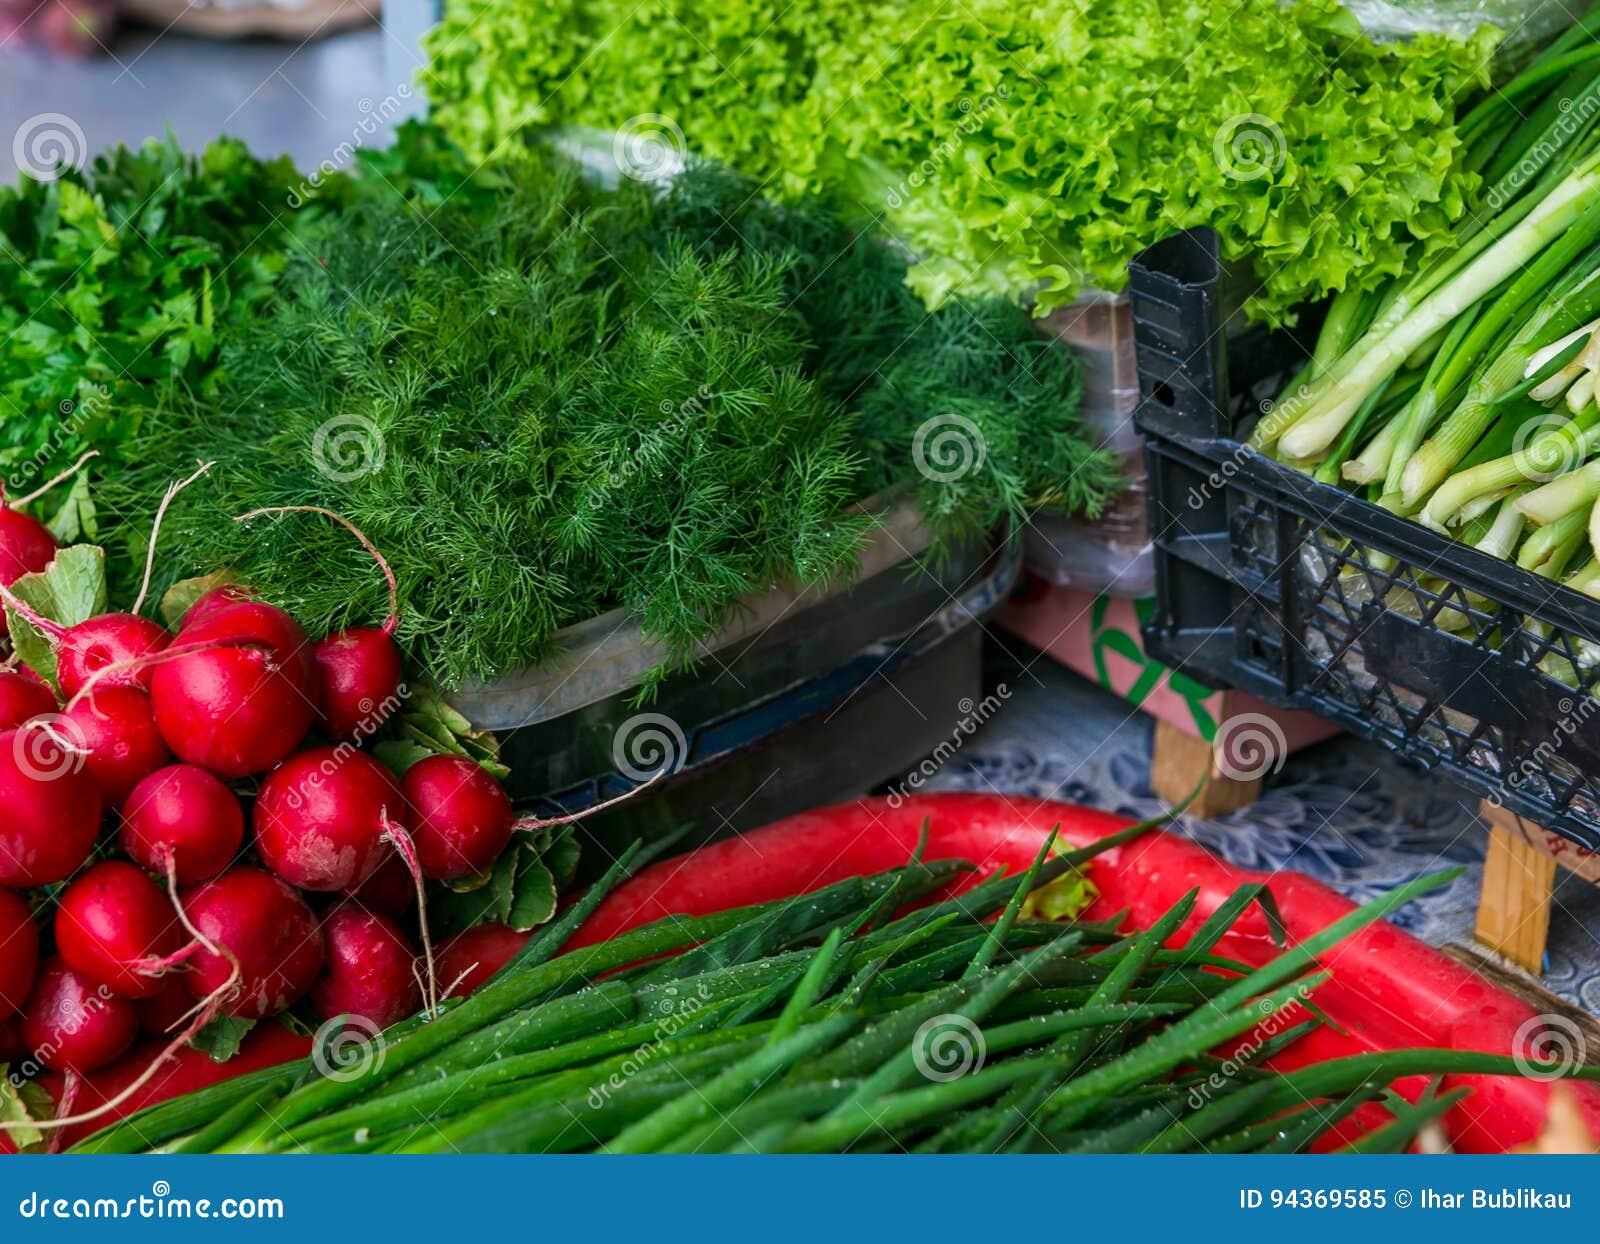 Légumes de ressort - oignon, radis, aneth, salade à vendre